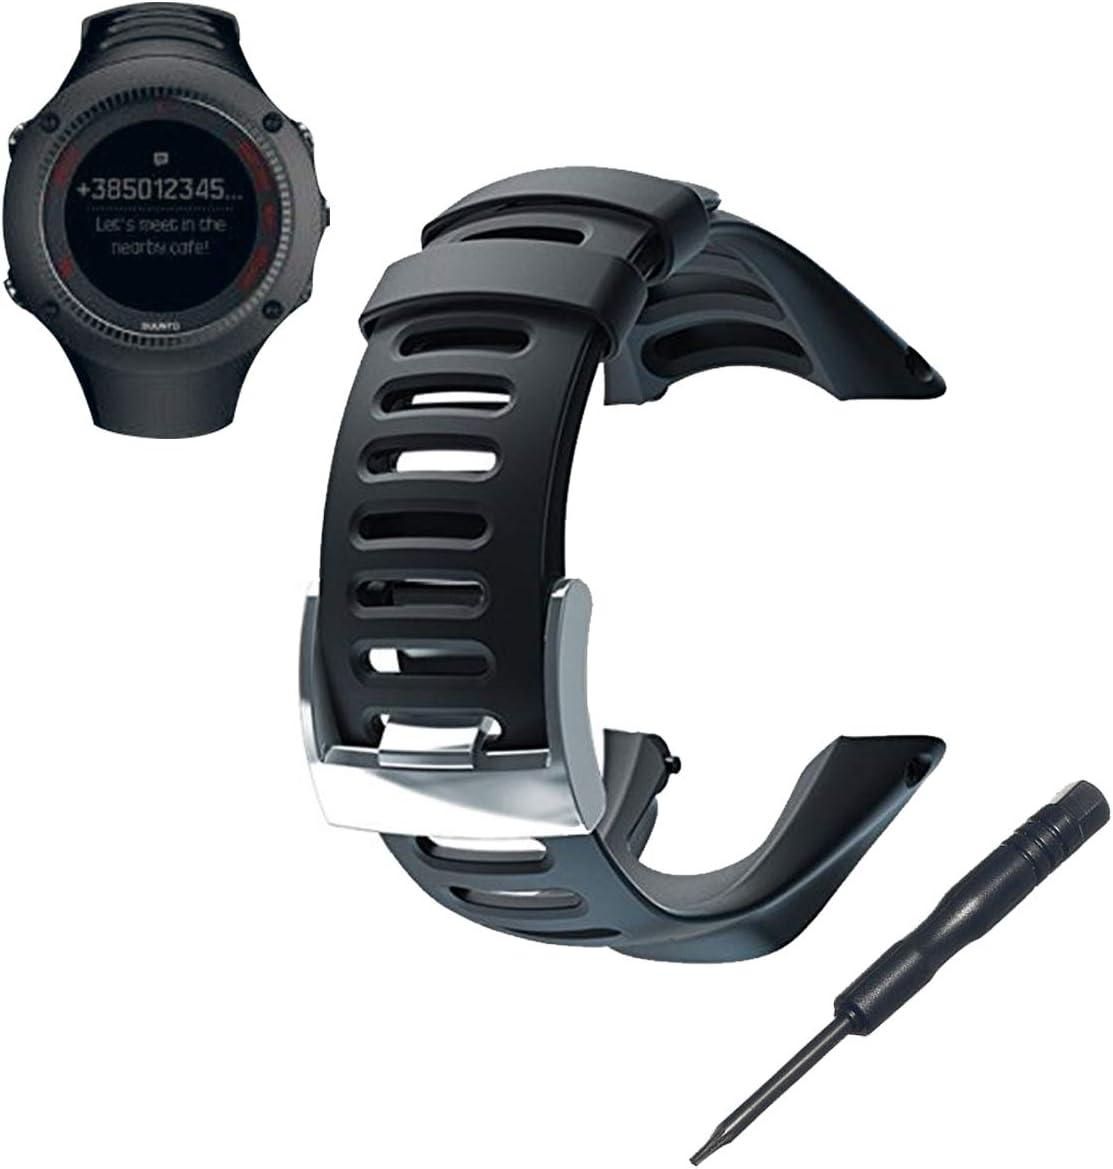 Reloj banda correa, phifo suave negro de goma de repuesto reloj banda correa con herramienta gratuita para Suunto Ambit 3 Pico/Ambit 2/1